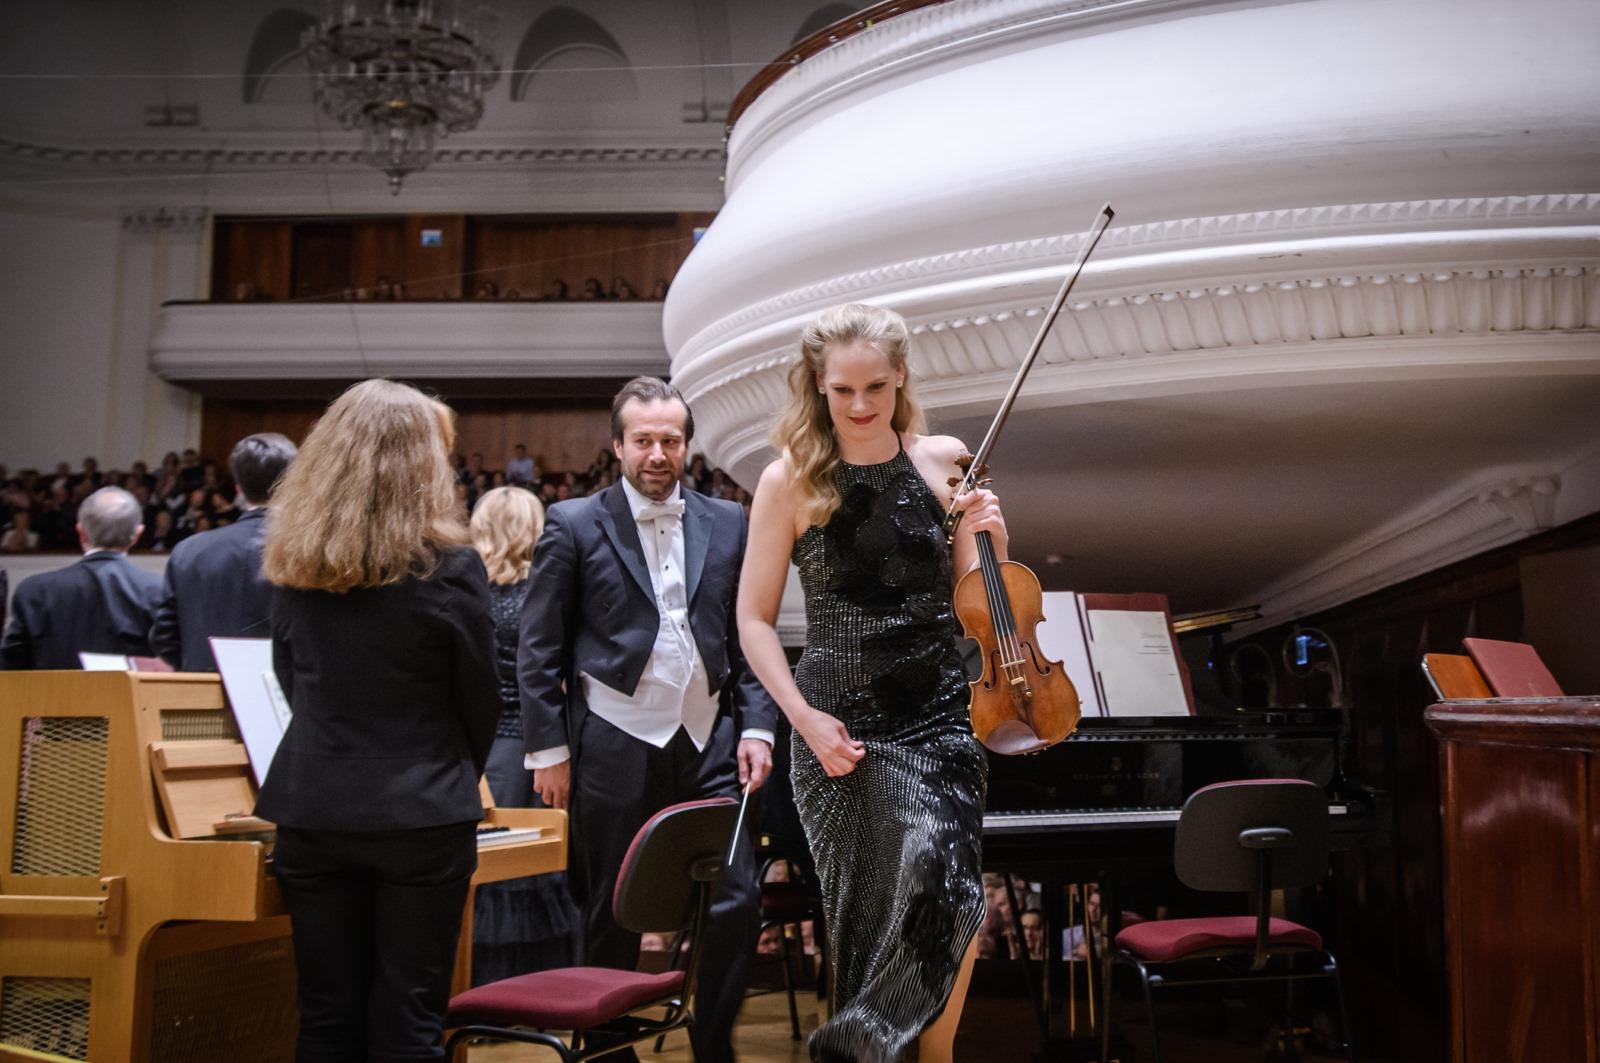 2019 - Poland, Warsaw Warsaw Philharmonic, Fabien Gabel Copyrigh DG ART Fotografia